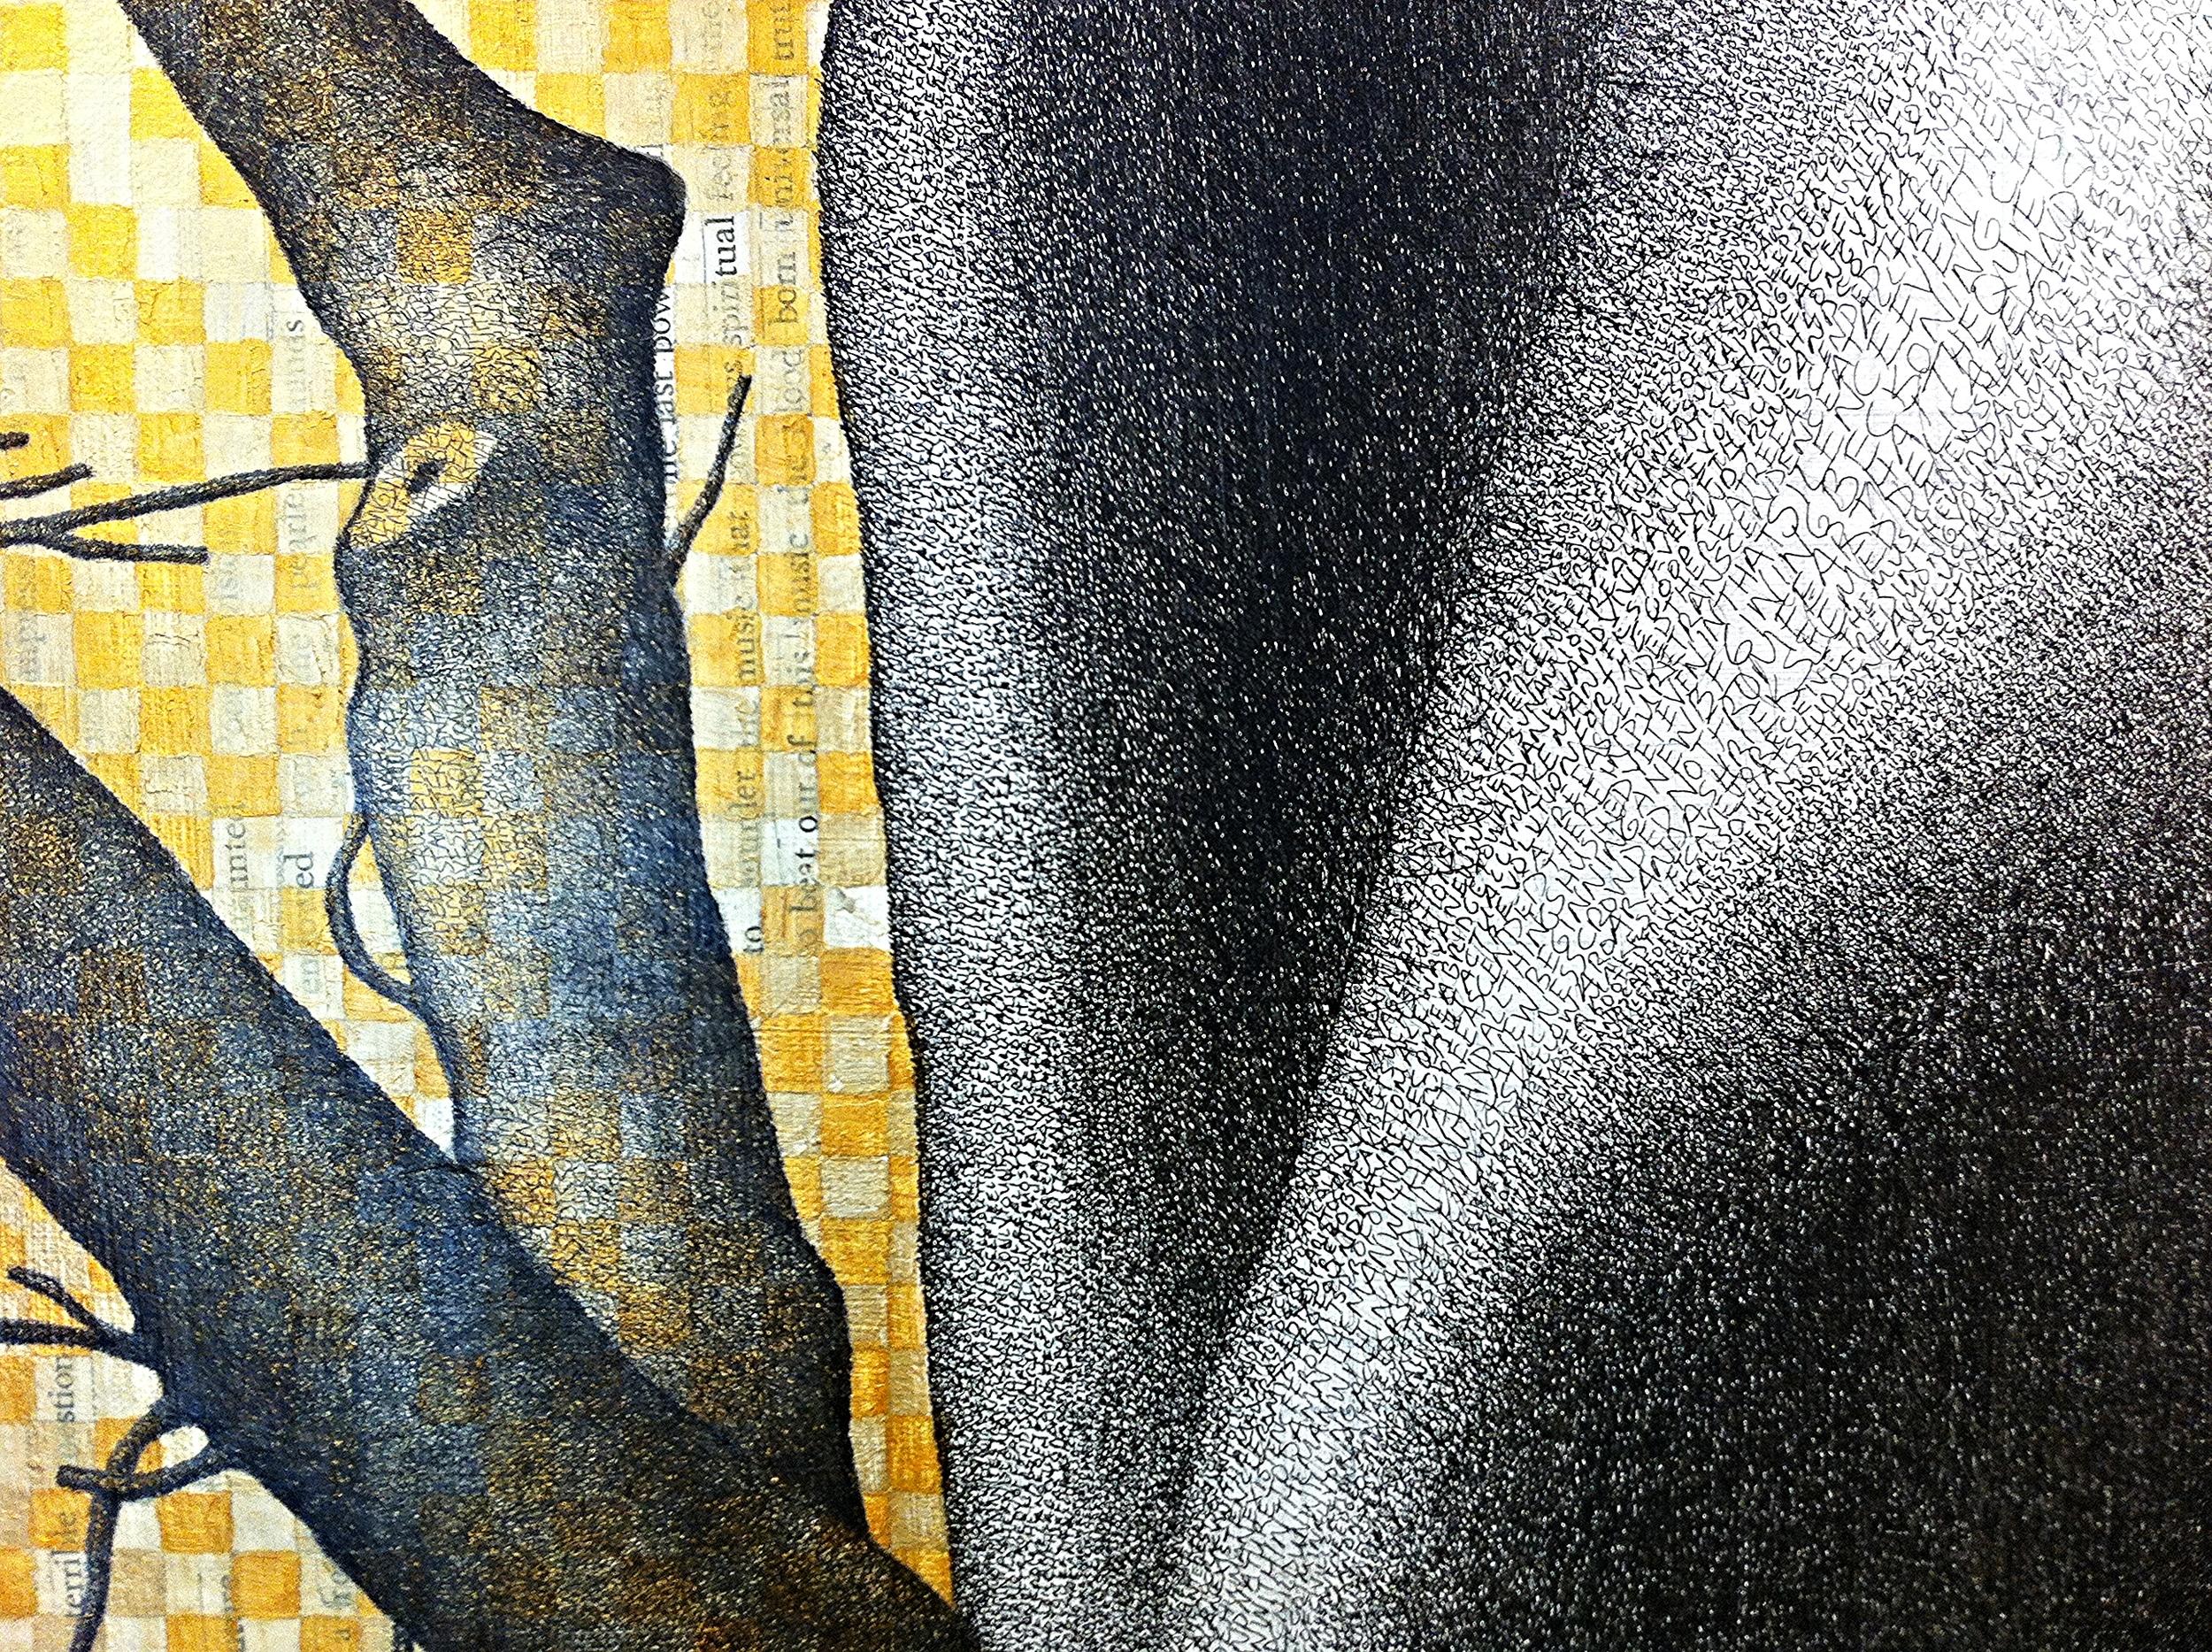 Detail III